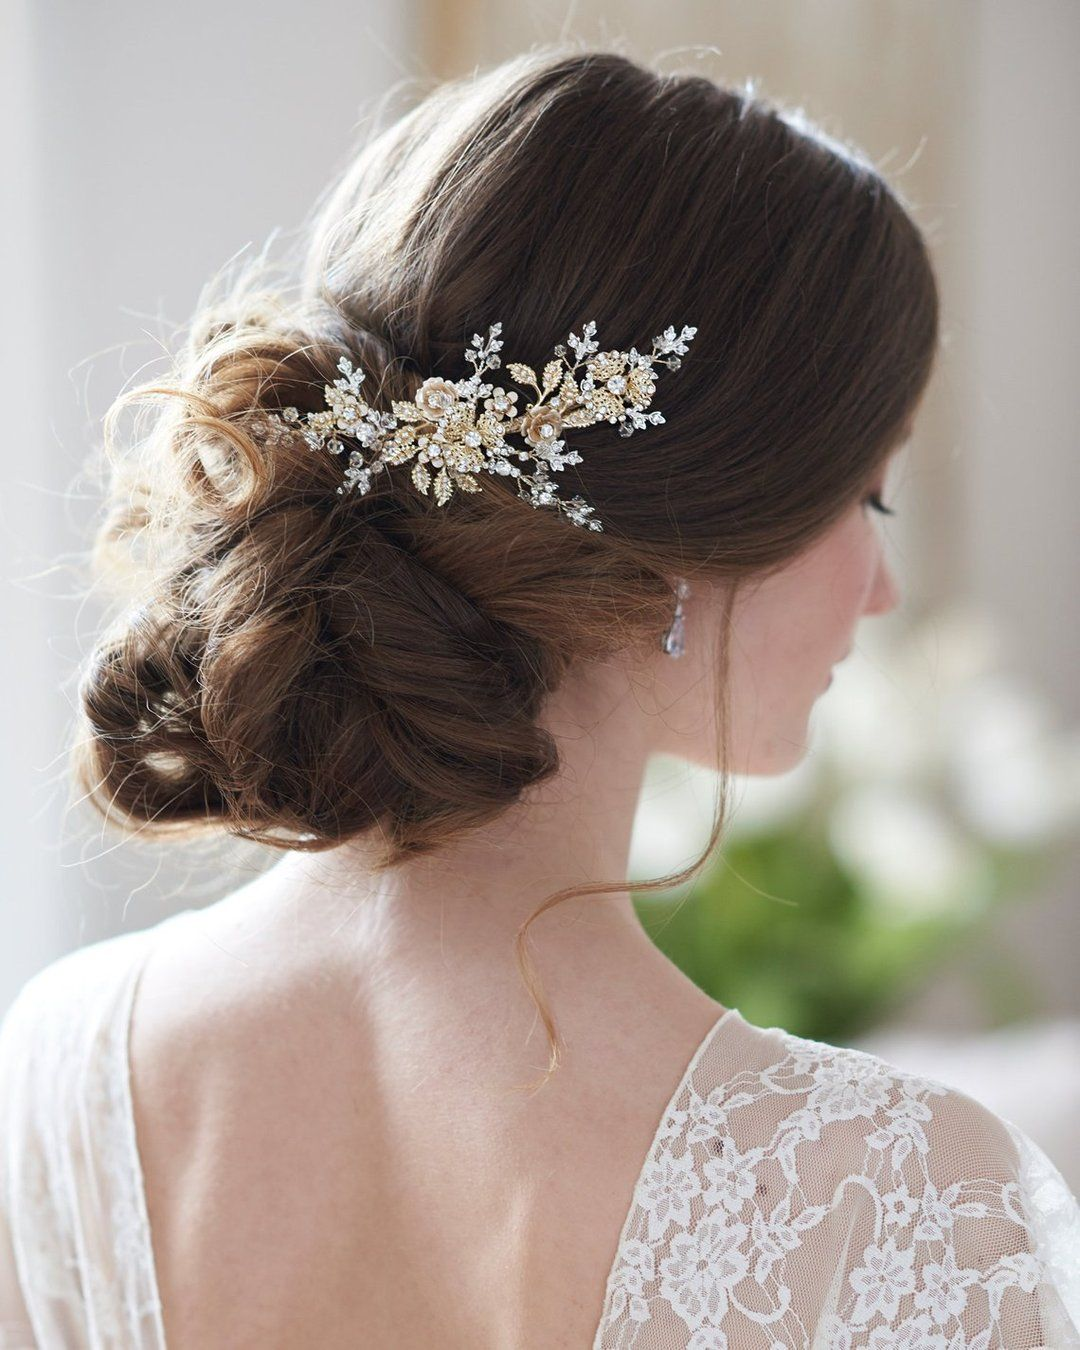 laurel bridal hair clip/comb in 2019 | bridal hair accessories